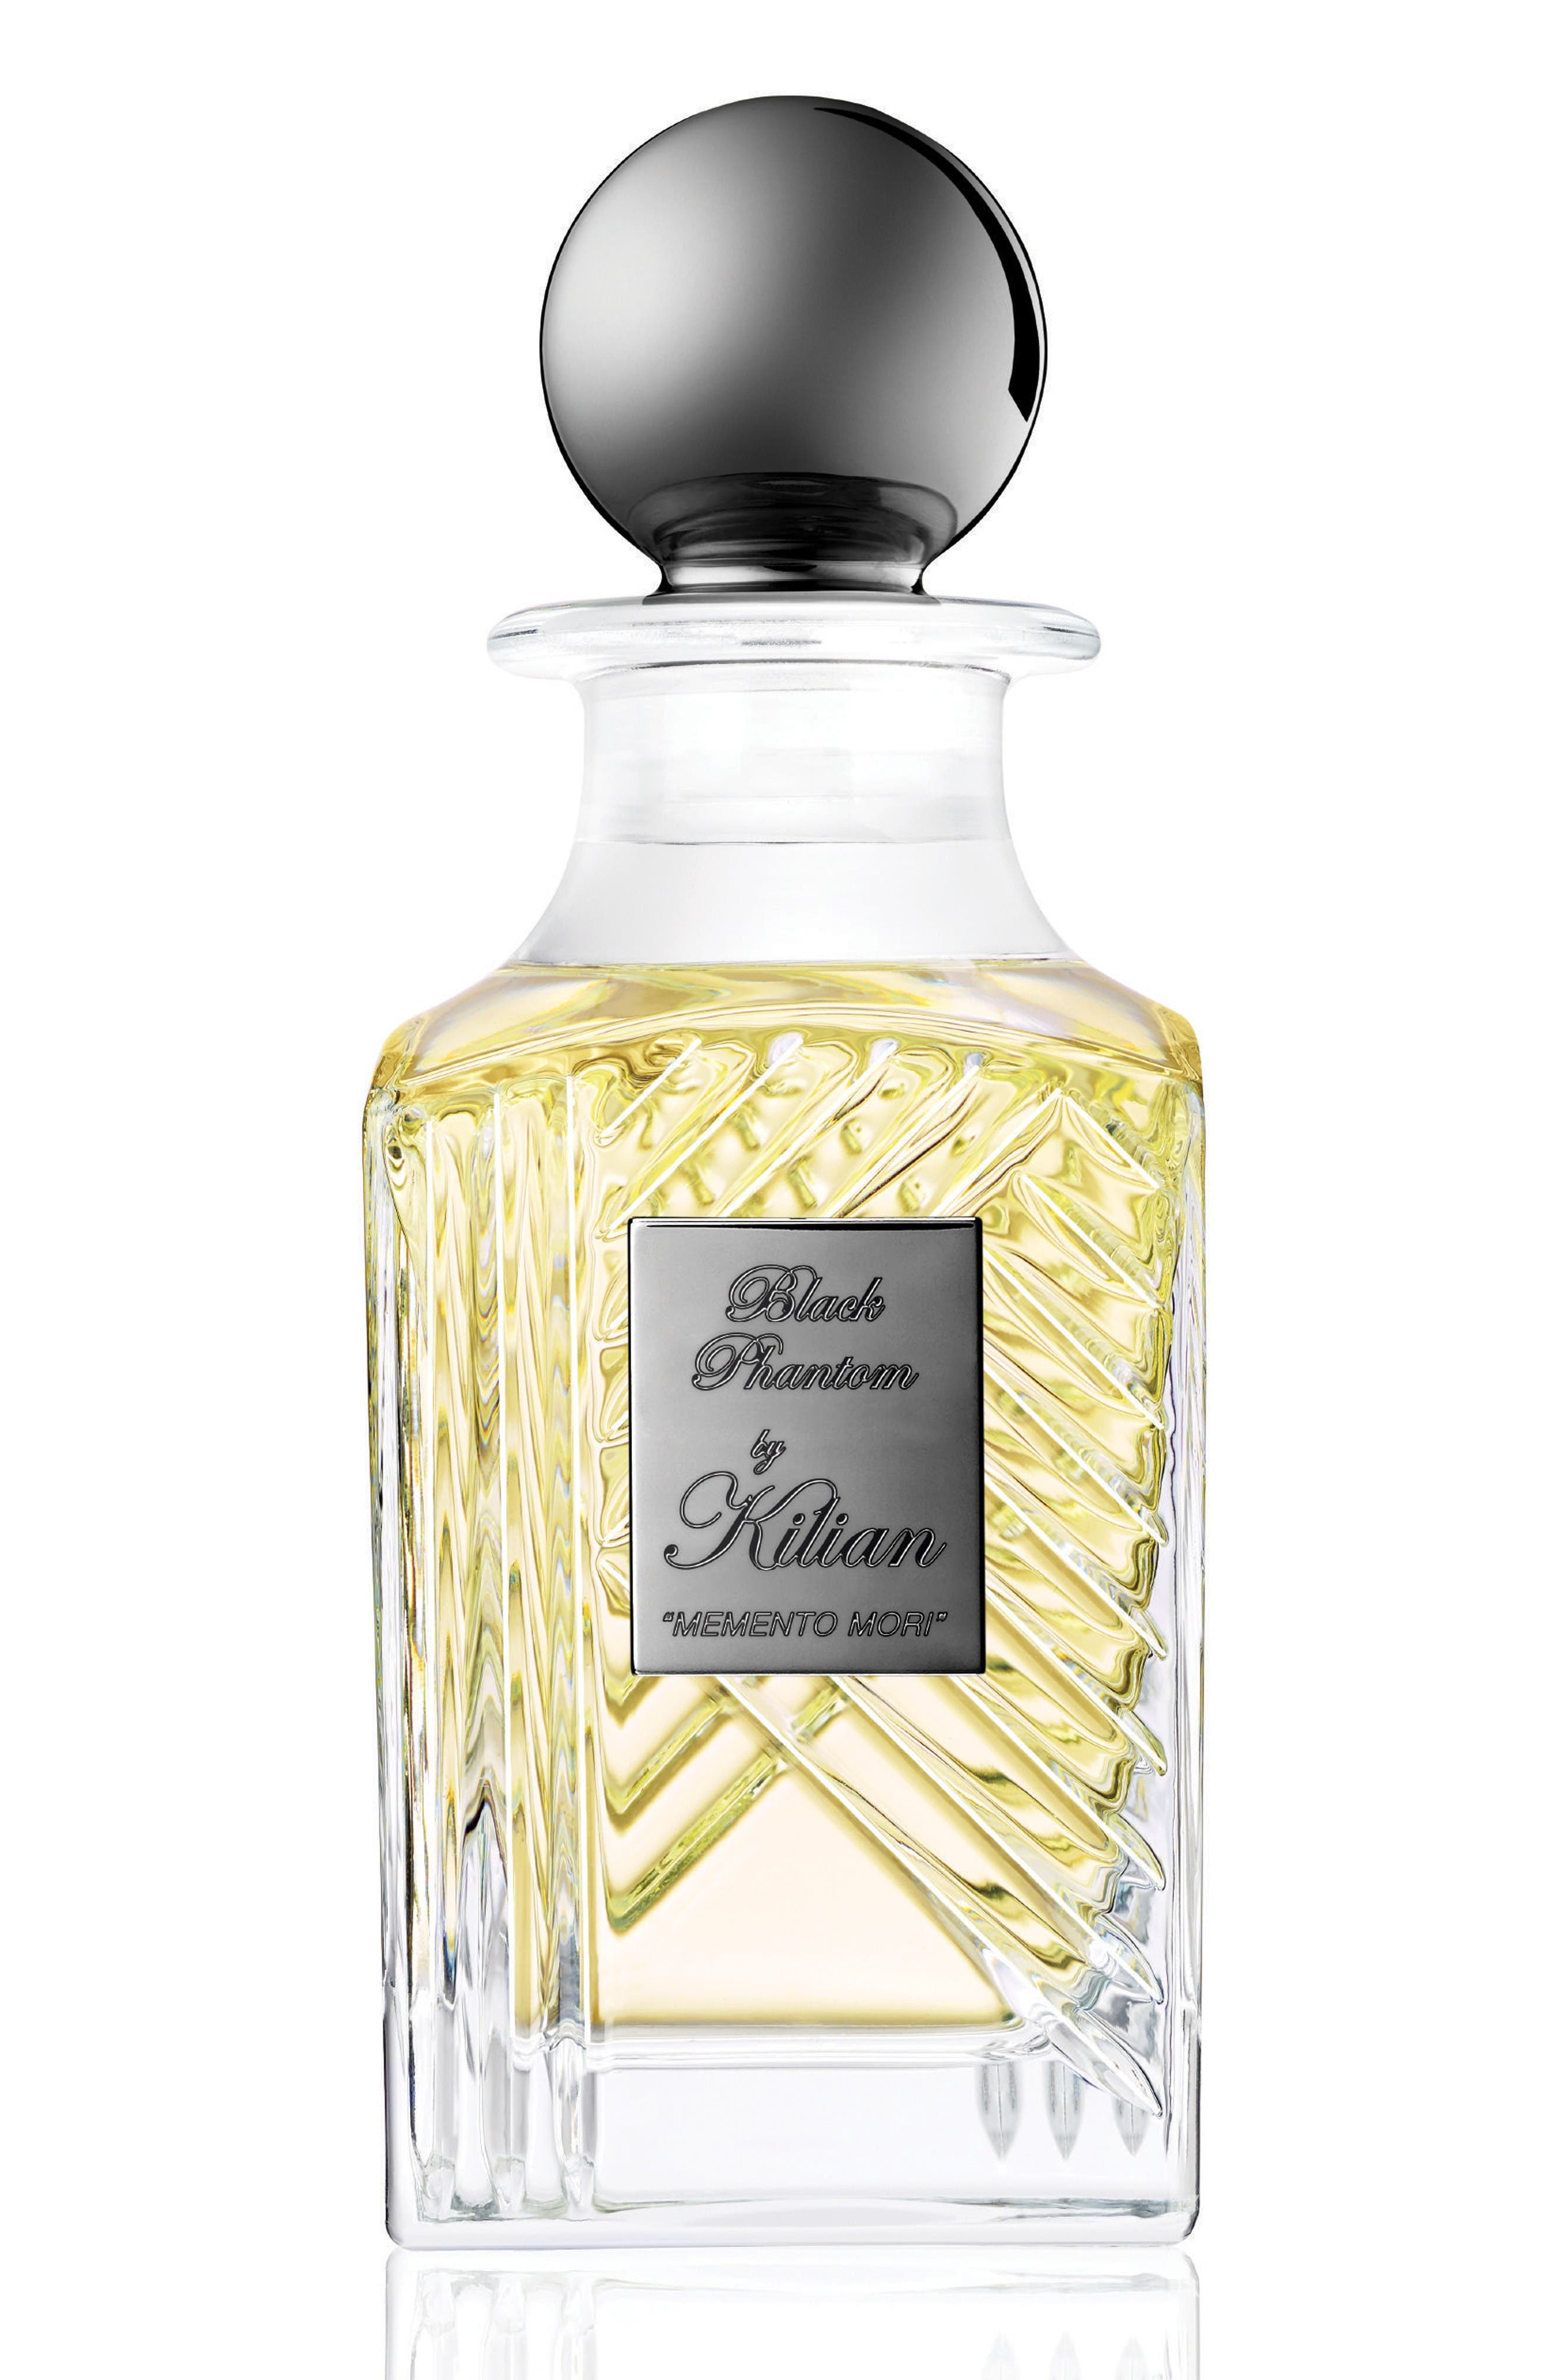 Main Image - Kilian Black Phantom Memento Mori Eau de Parfum Mini Carafe